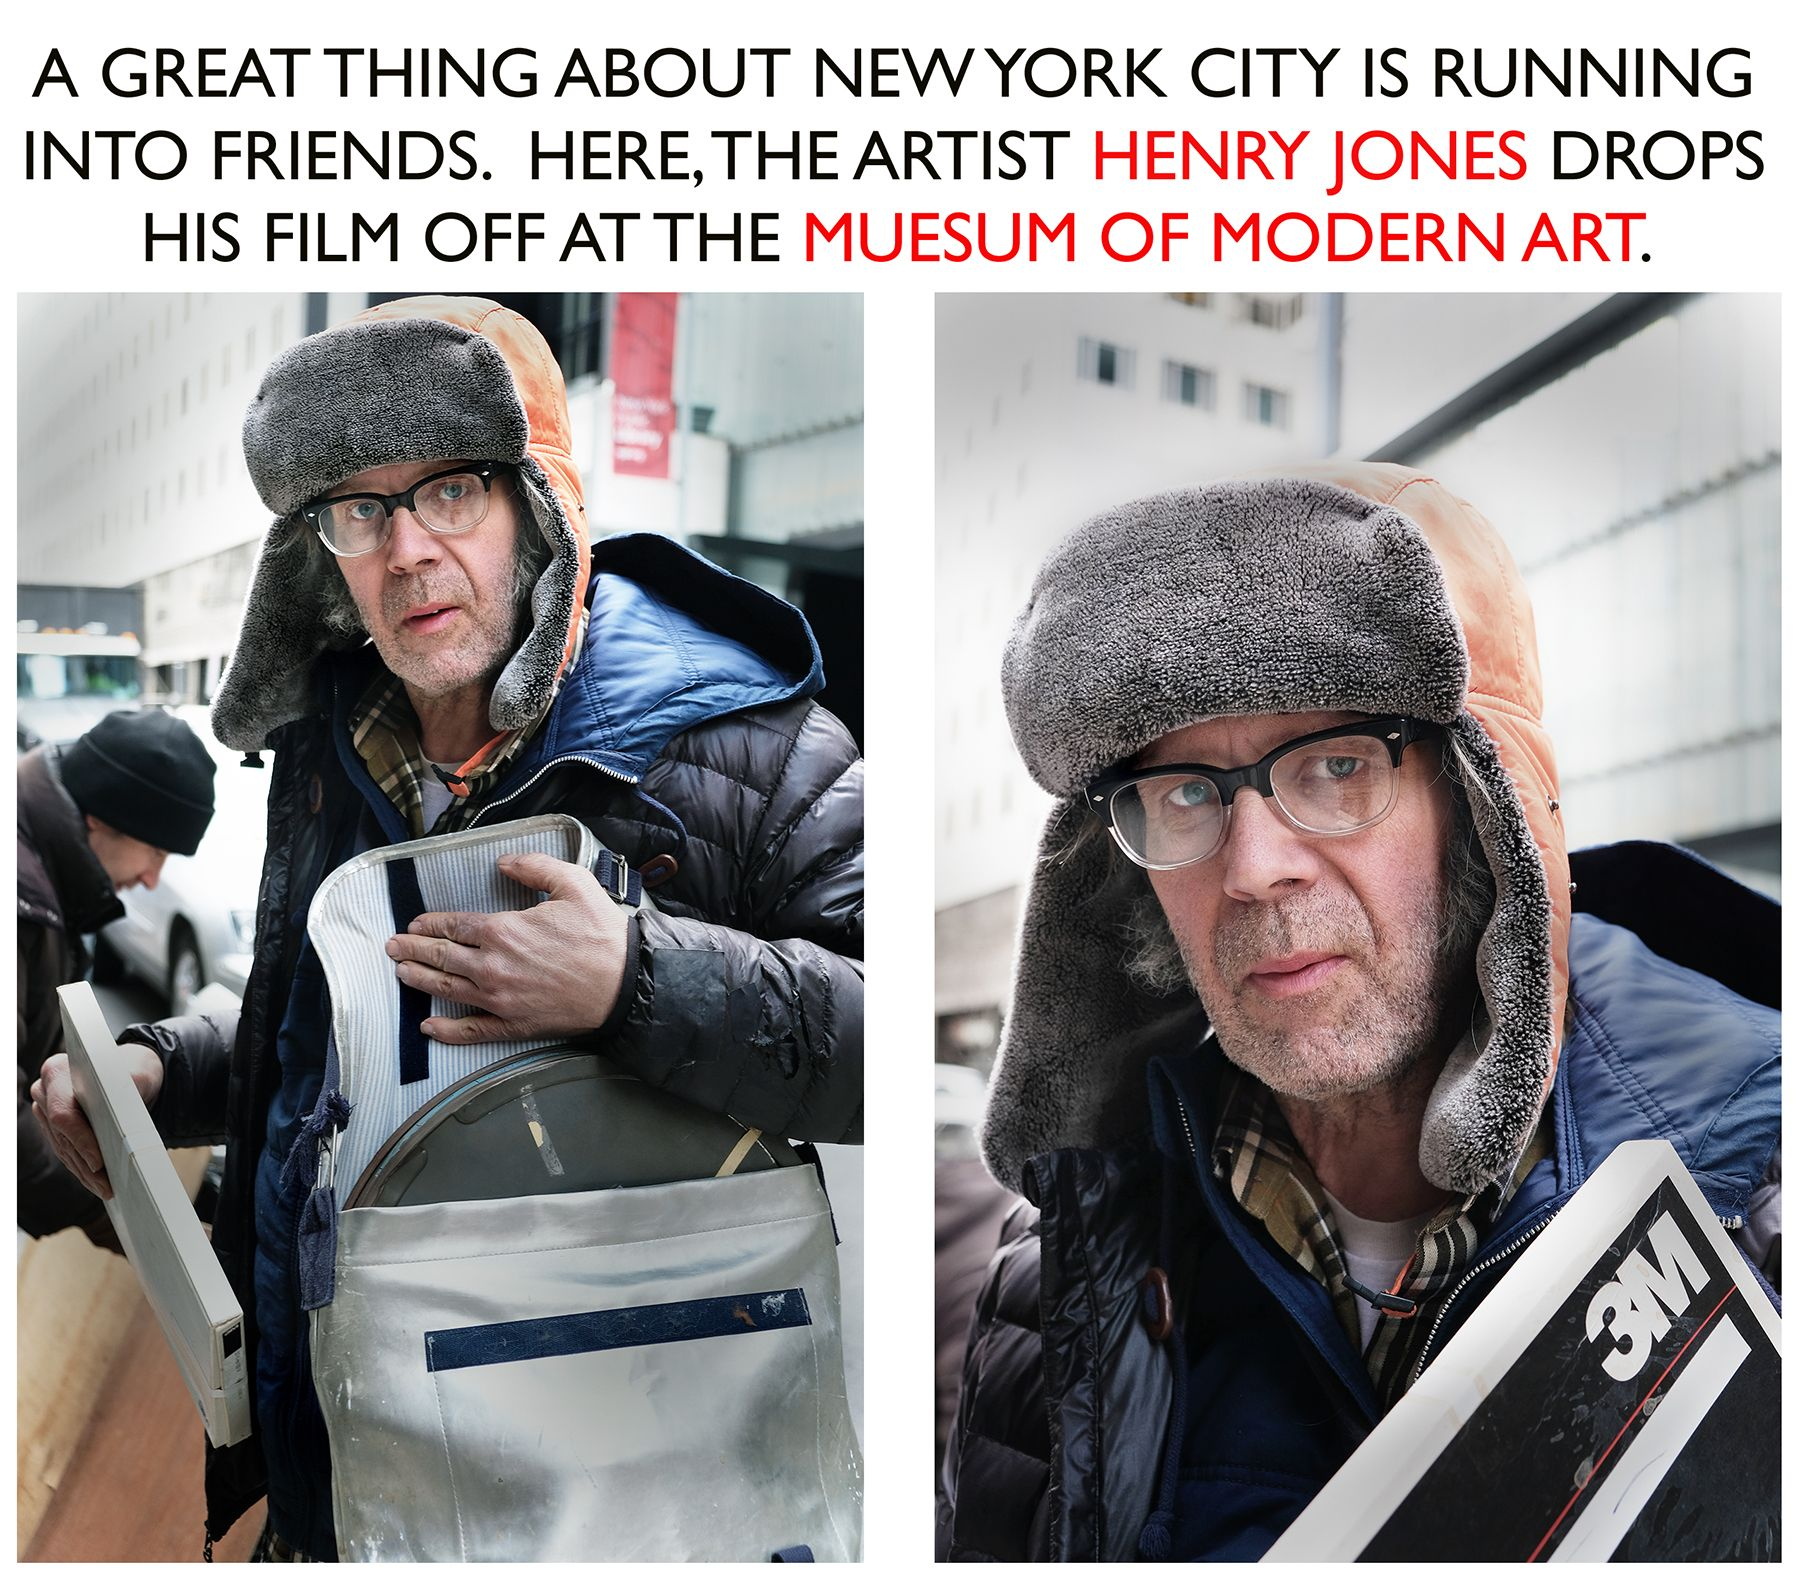 HENRY JAMES AT MOMA HOMEPAGE copy.jpg